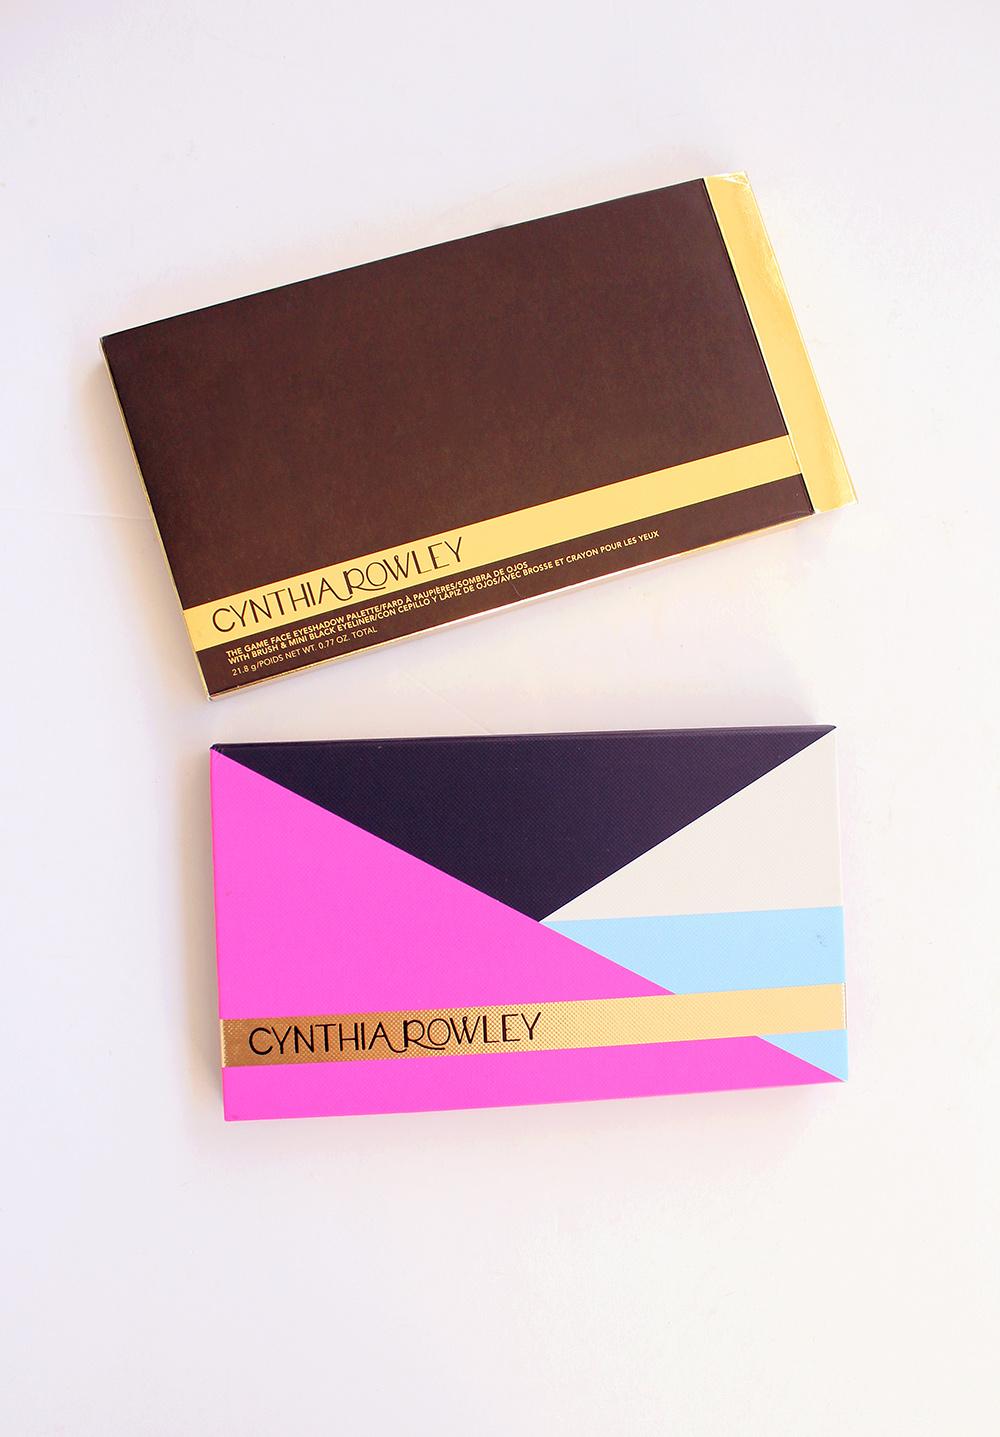 Cynthia-Rowley-makeup